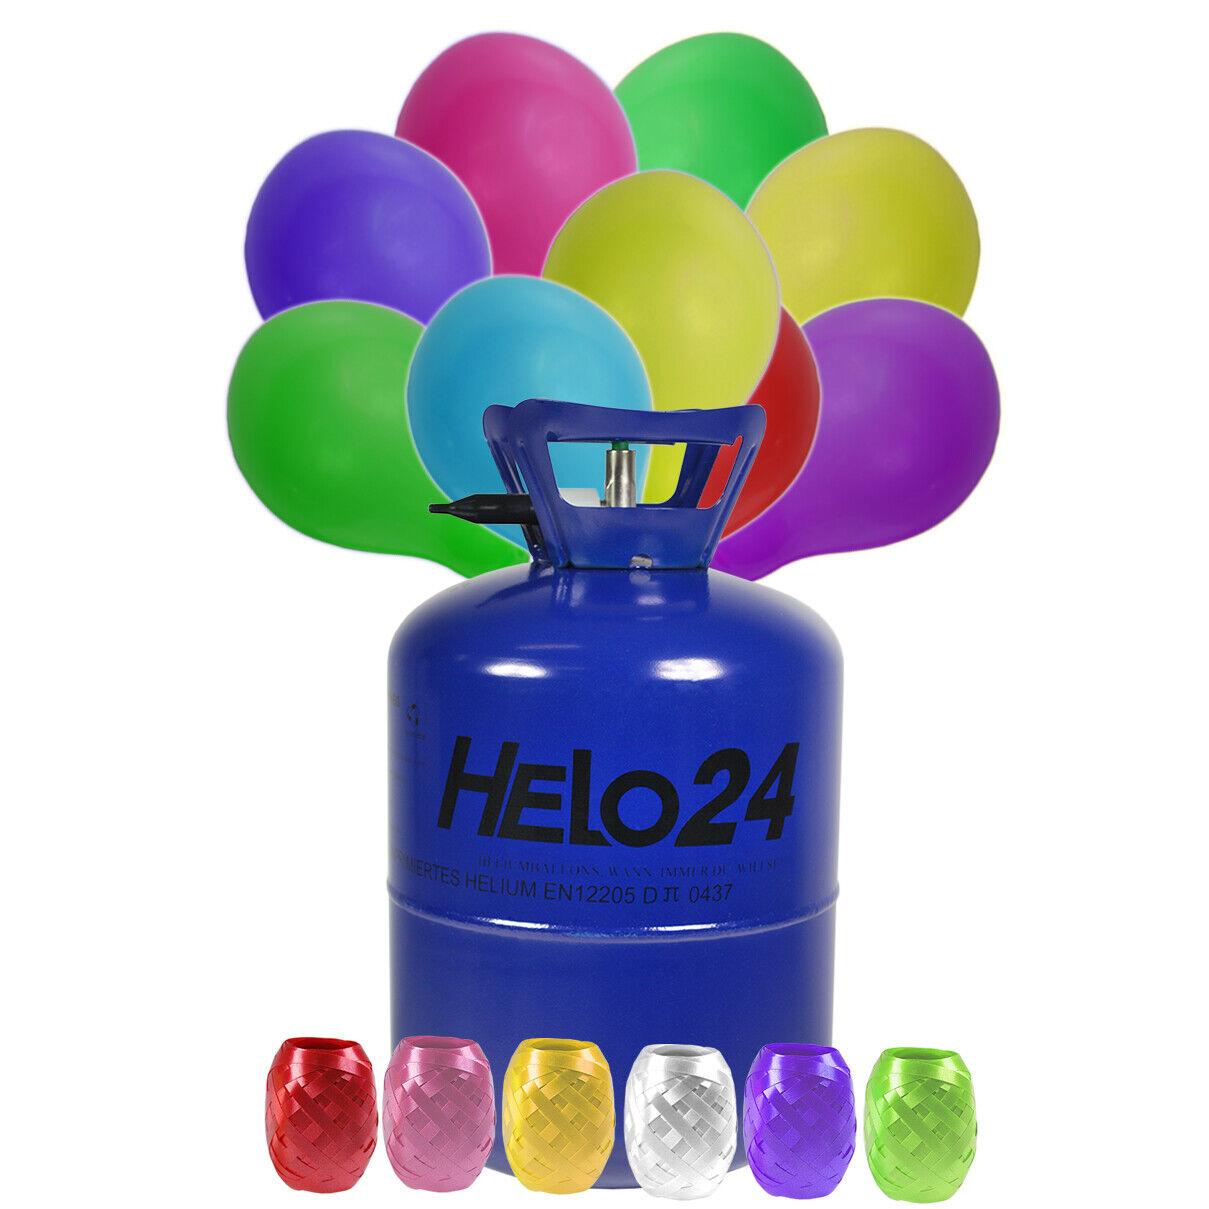 Helium Ballongas  0,45 m³ Heliumflasche Gas 50 Luftballons inkl 50 Luftballons